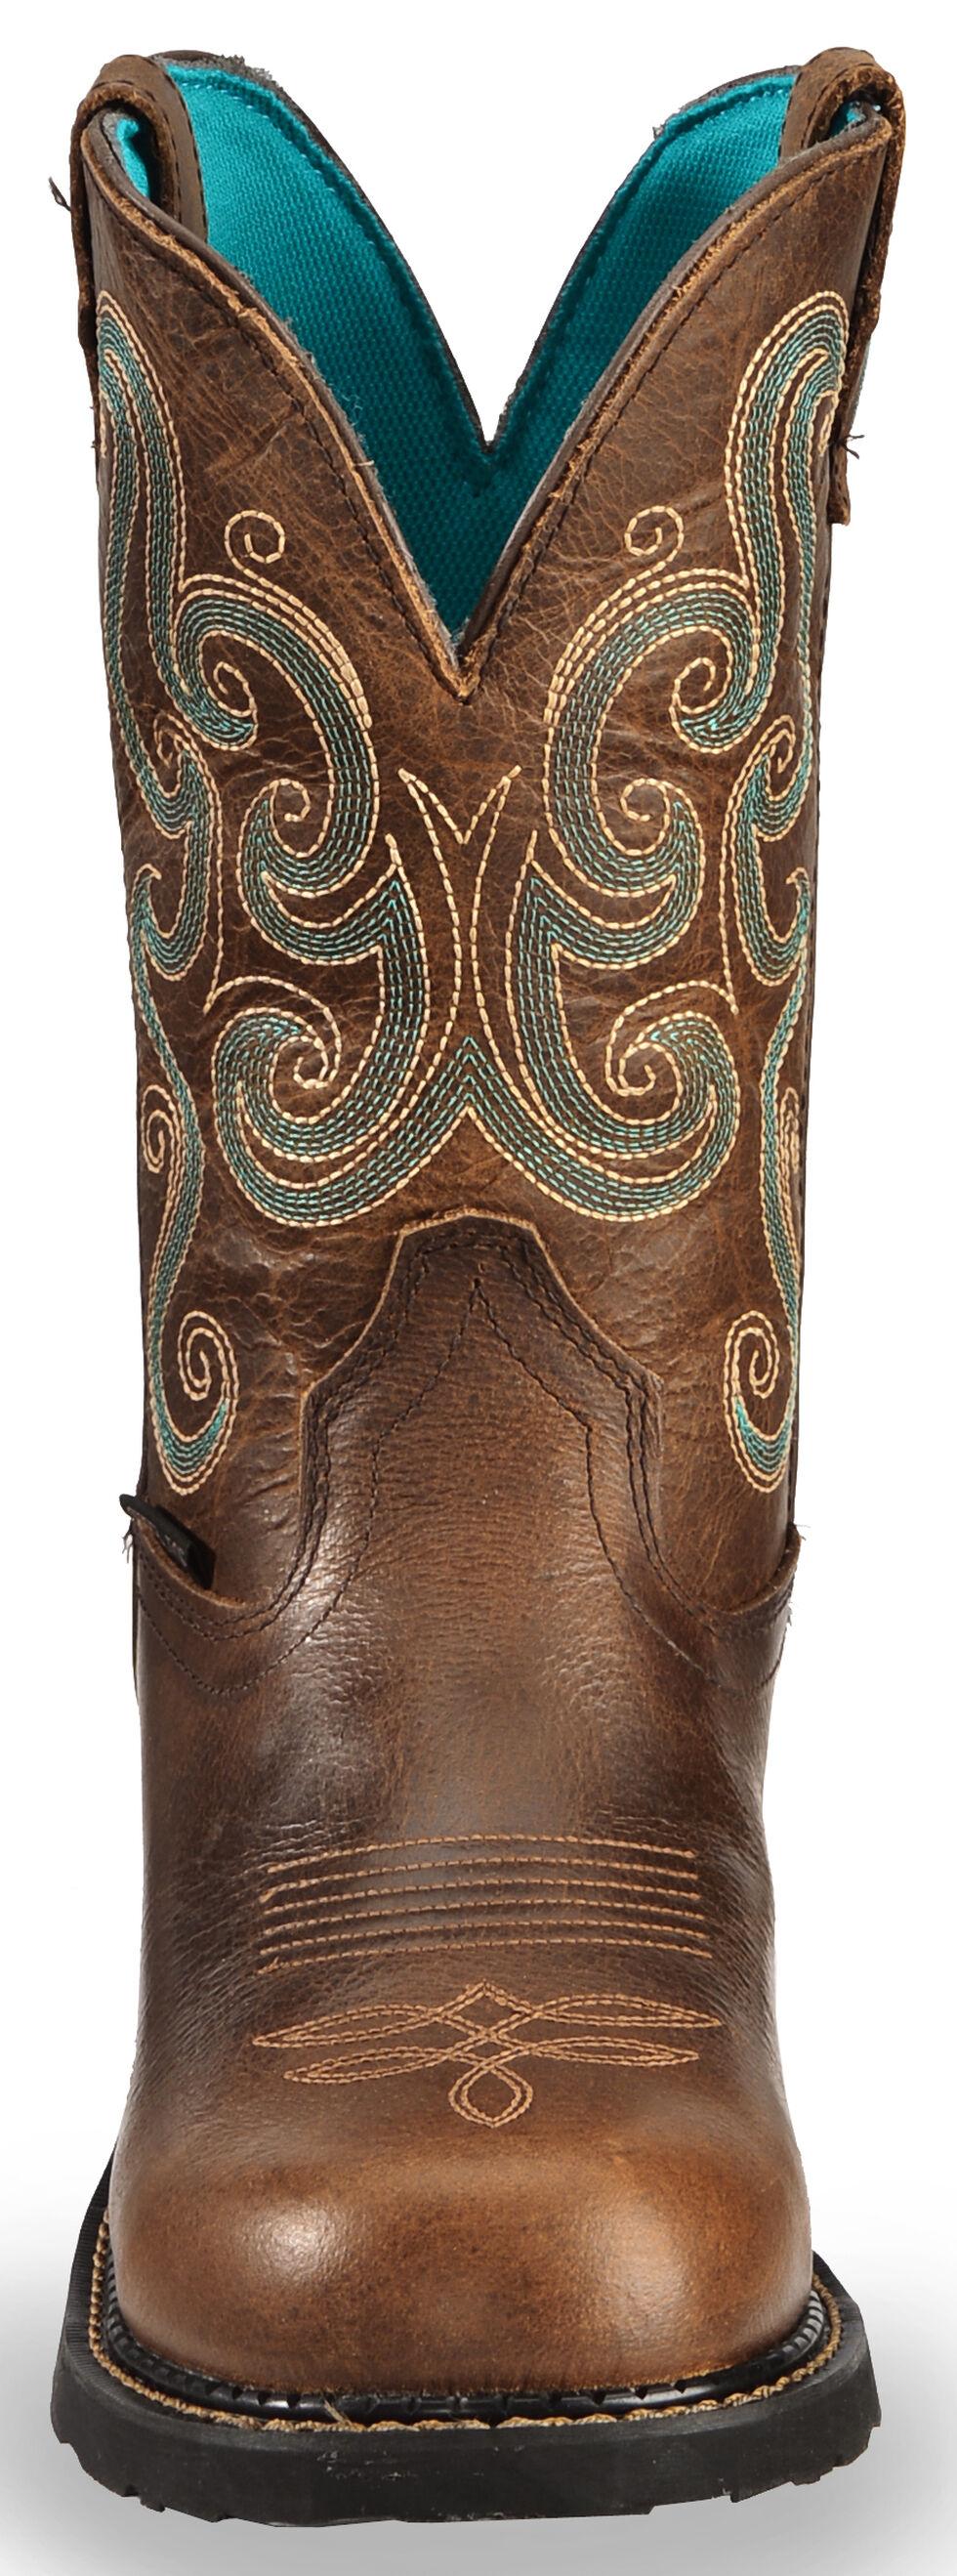 Justin Gypsy Women's Tasha EH Waterproof Work Boots - Steel Toe, Chocolate, hi-res